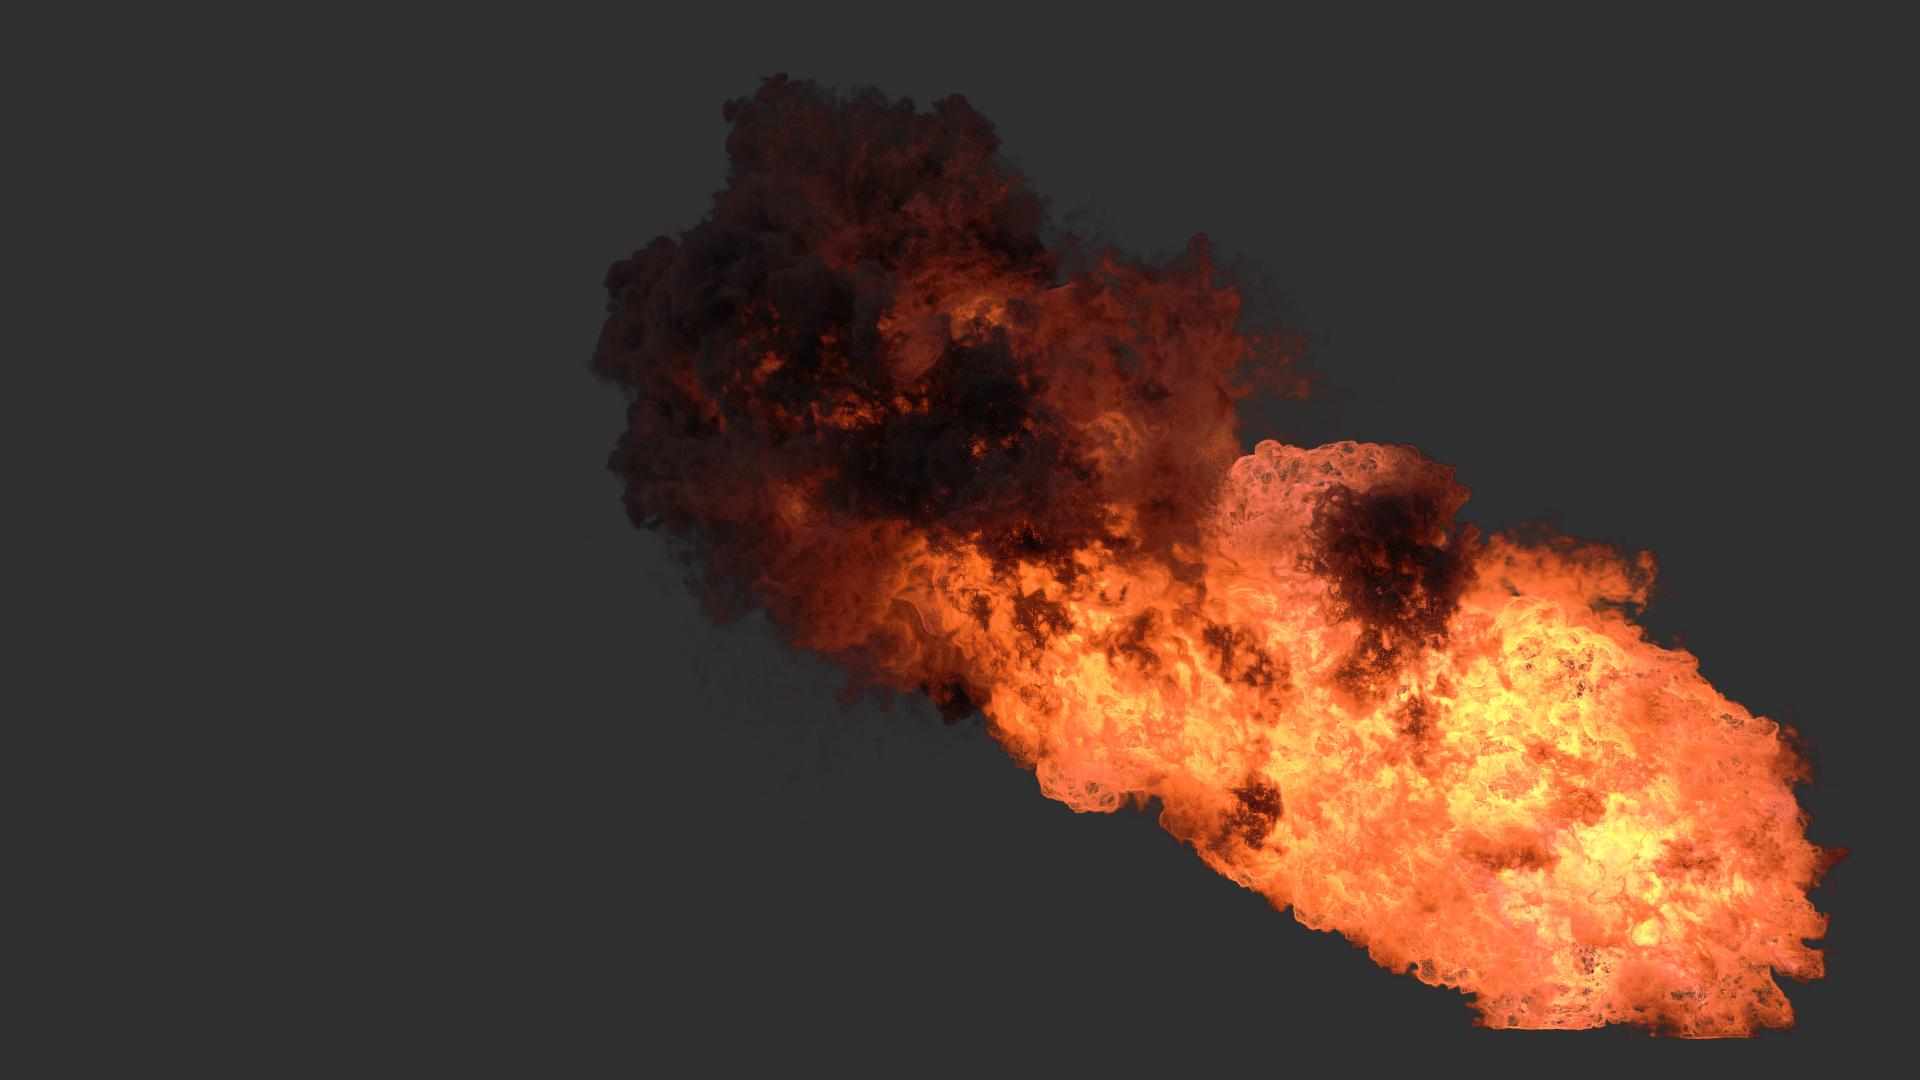 Houdini Redshift - Burning fire asset